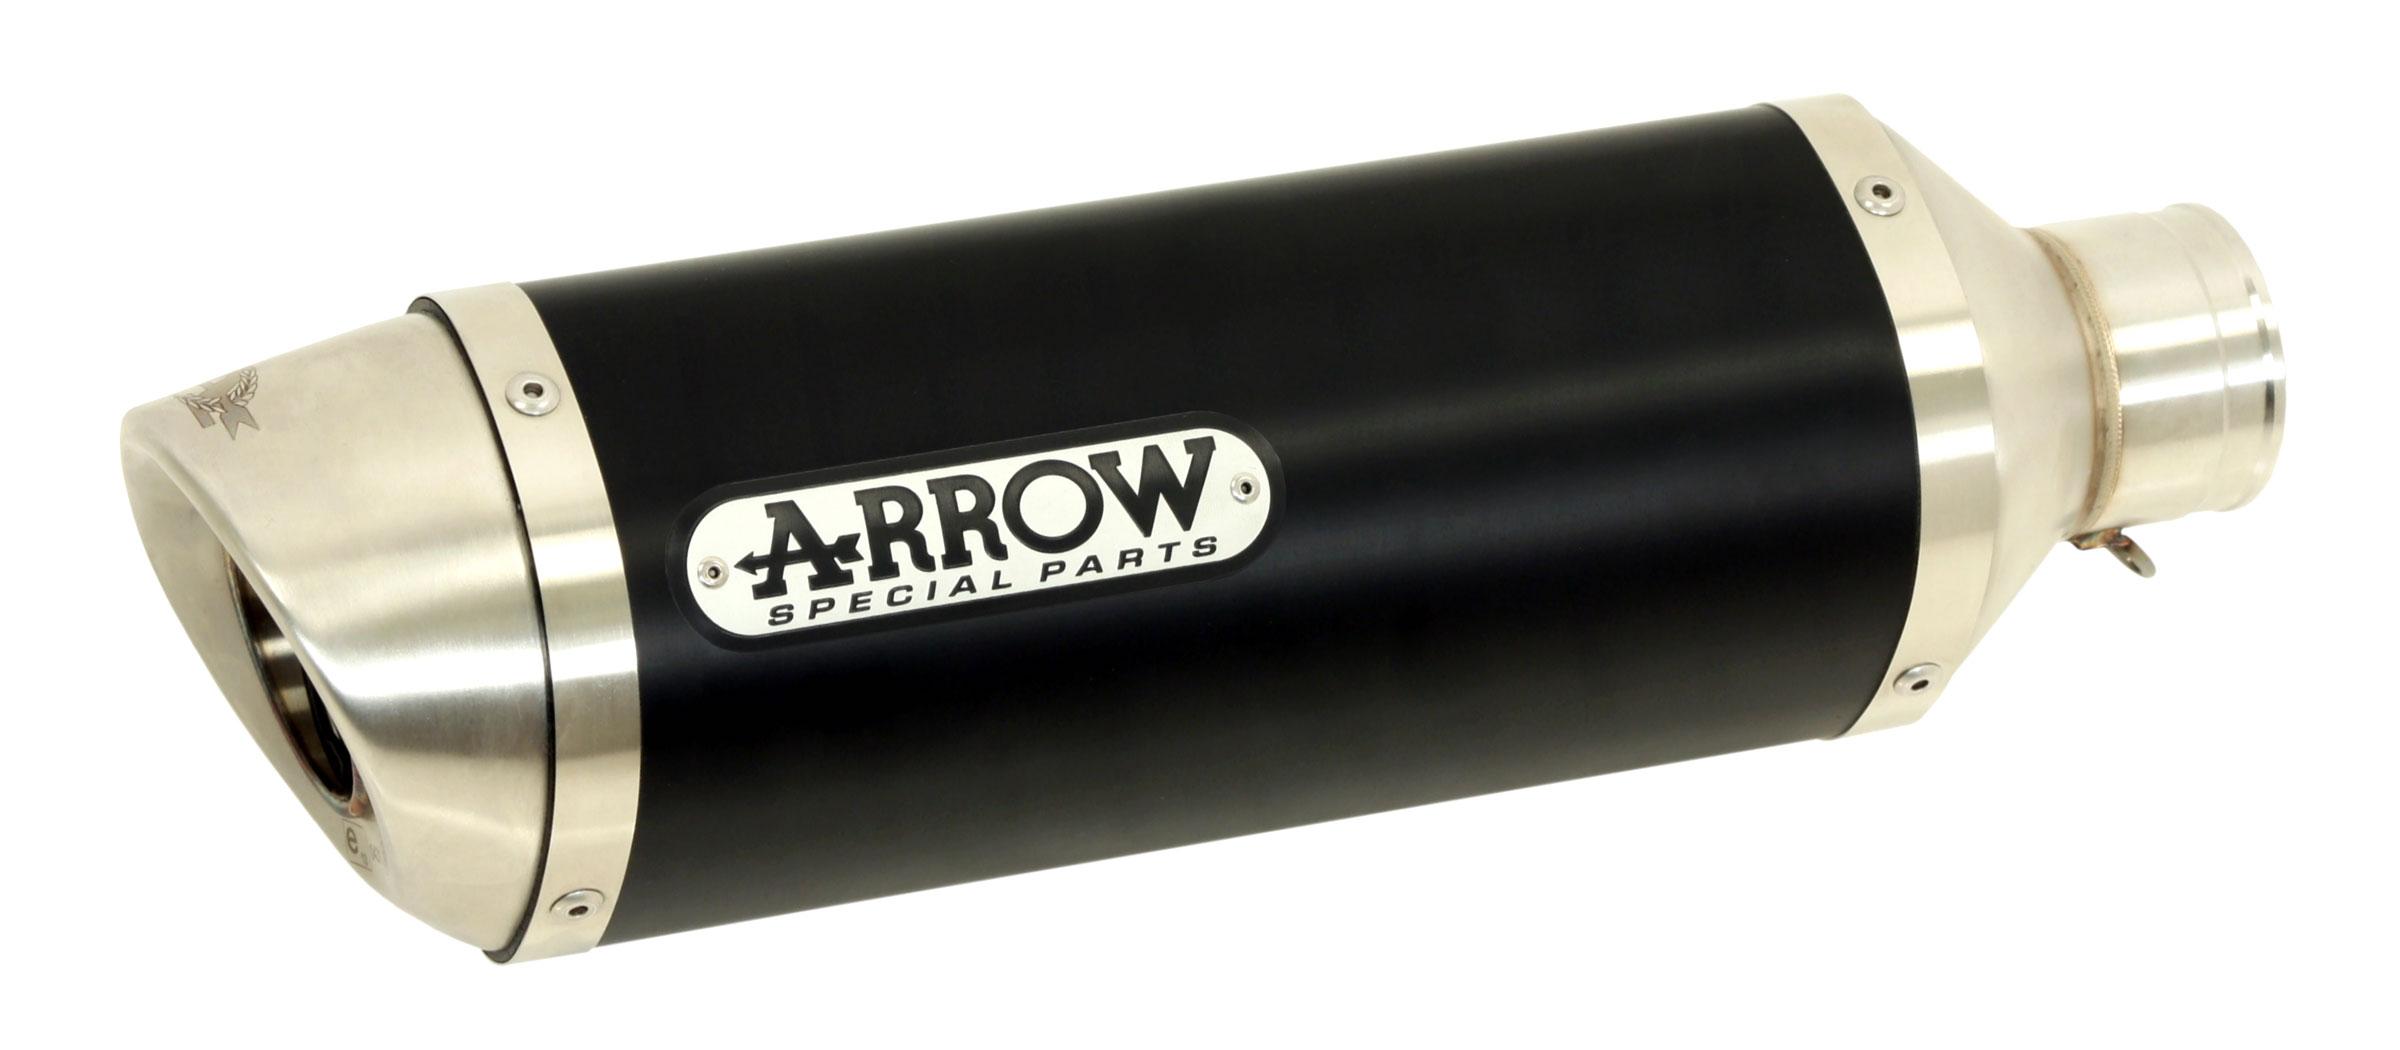 ARROW Auspuff DARK THUNDER für Honda CBF125 2009-2014, Aluminium (Nur für ARROW Krümmer)